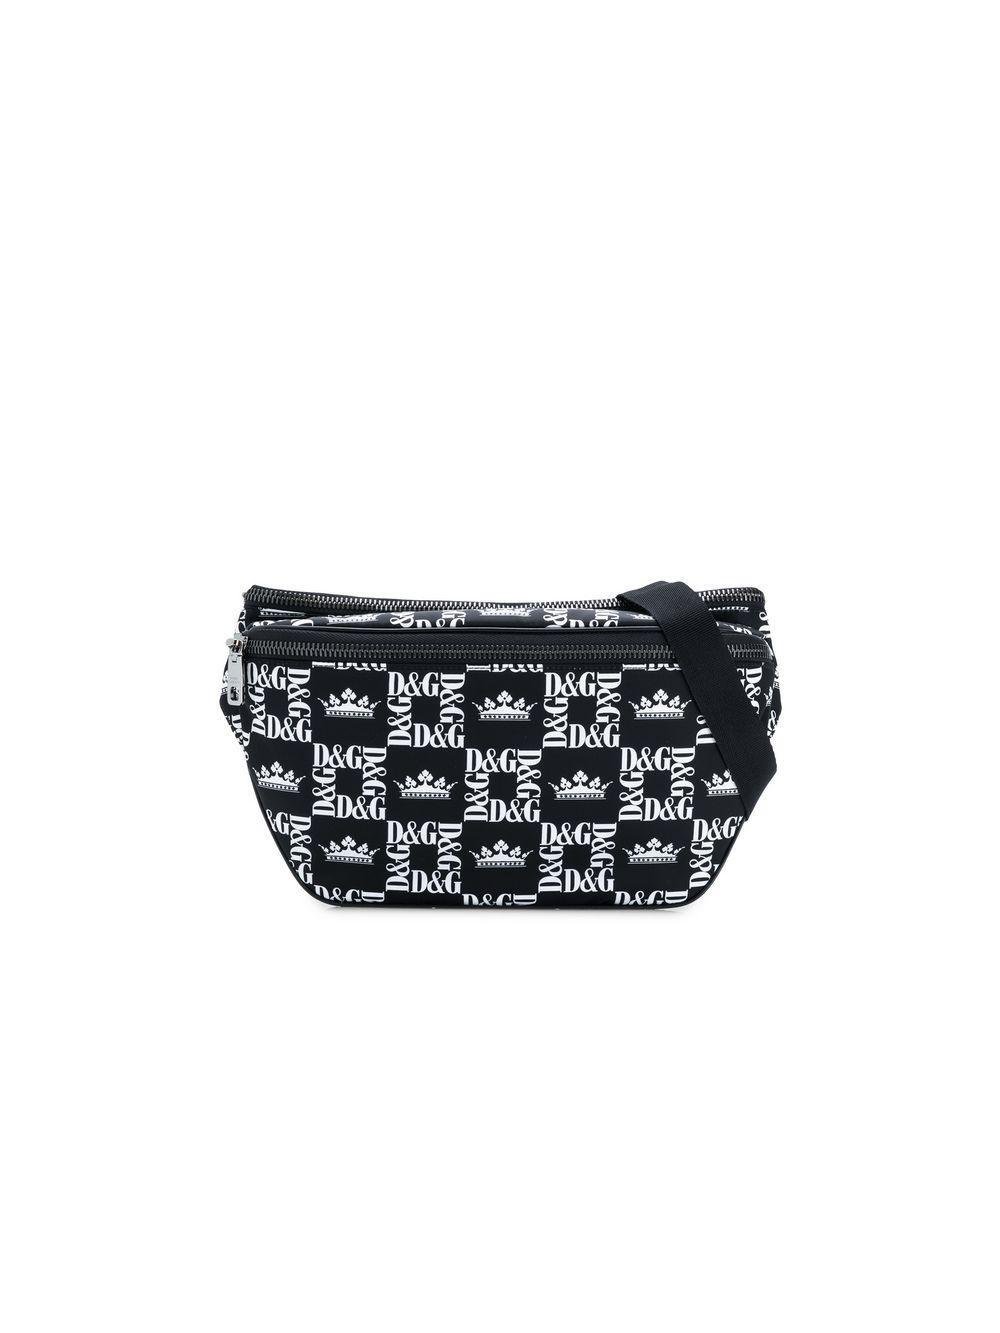 b3c6737b52 Dolce & Gabbana. Men's Black And White Logo Crown Print Cross Body Bag